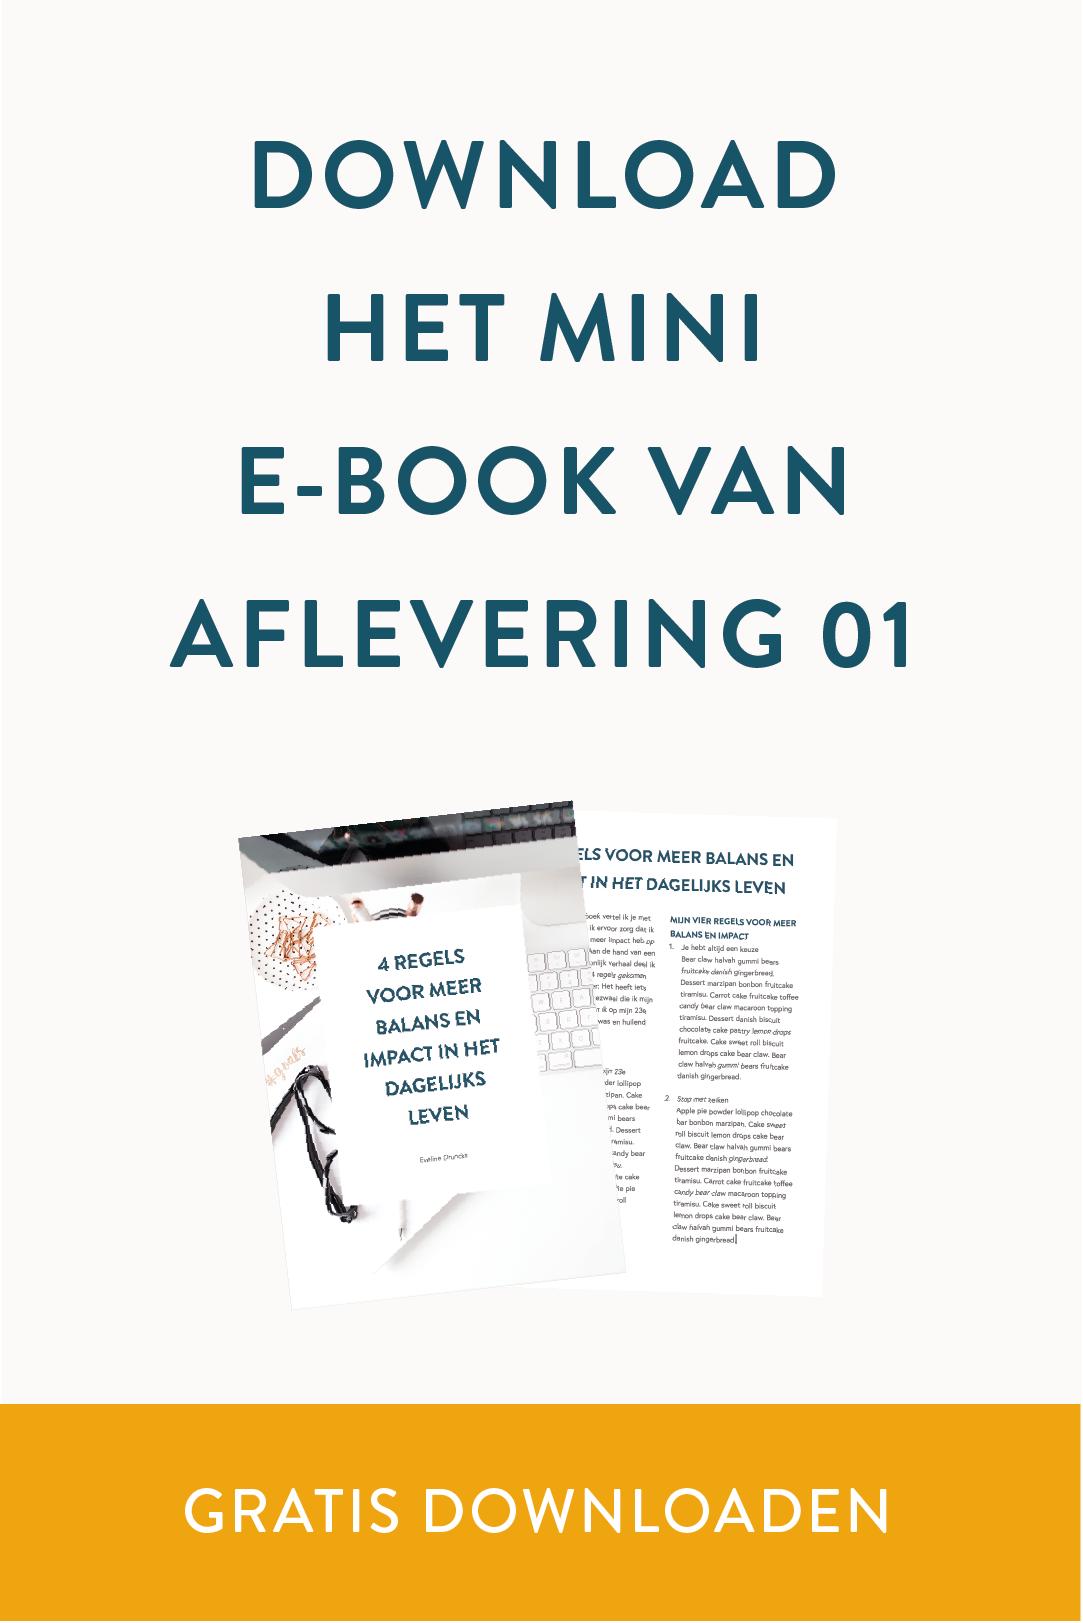 miniboek-1-downloadbutton-05.png